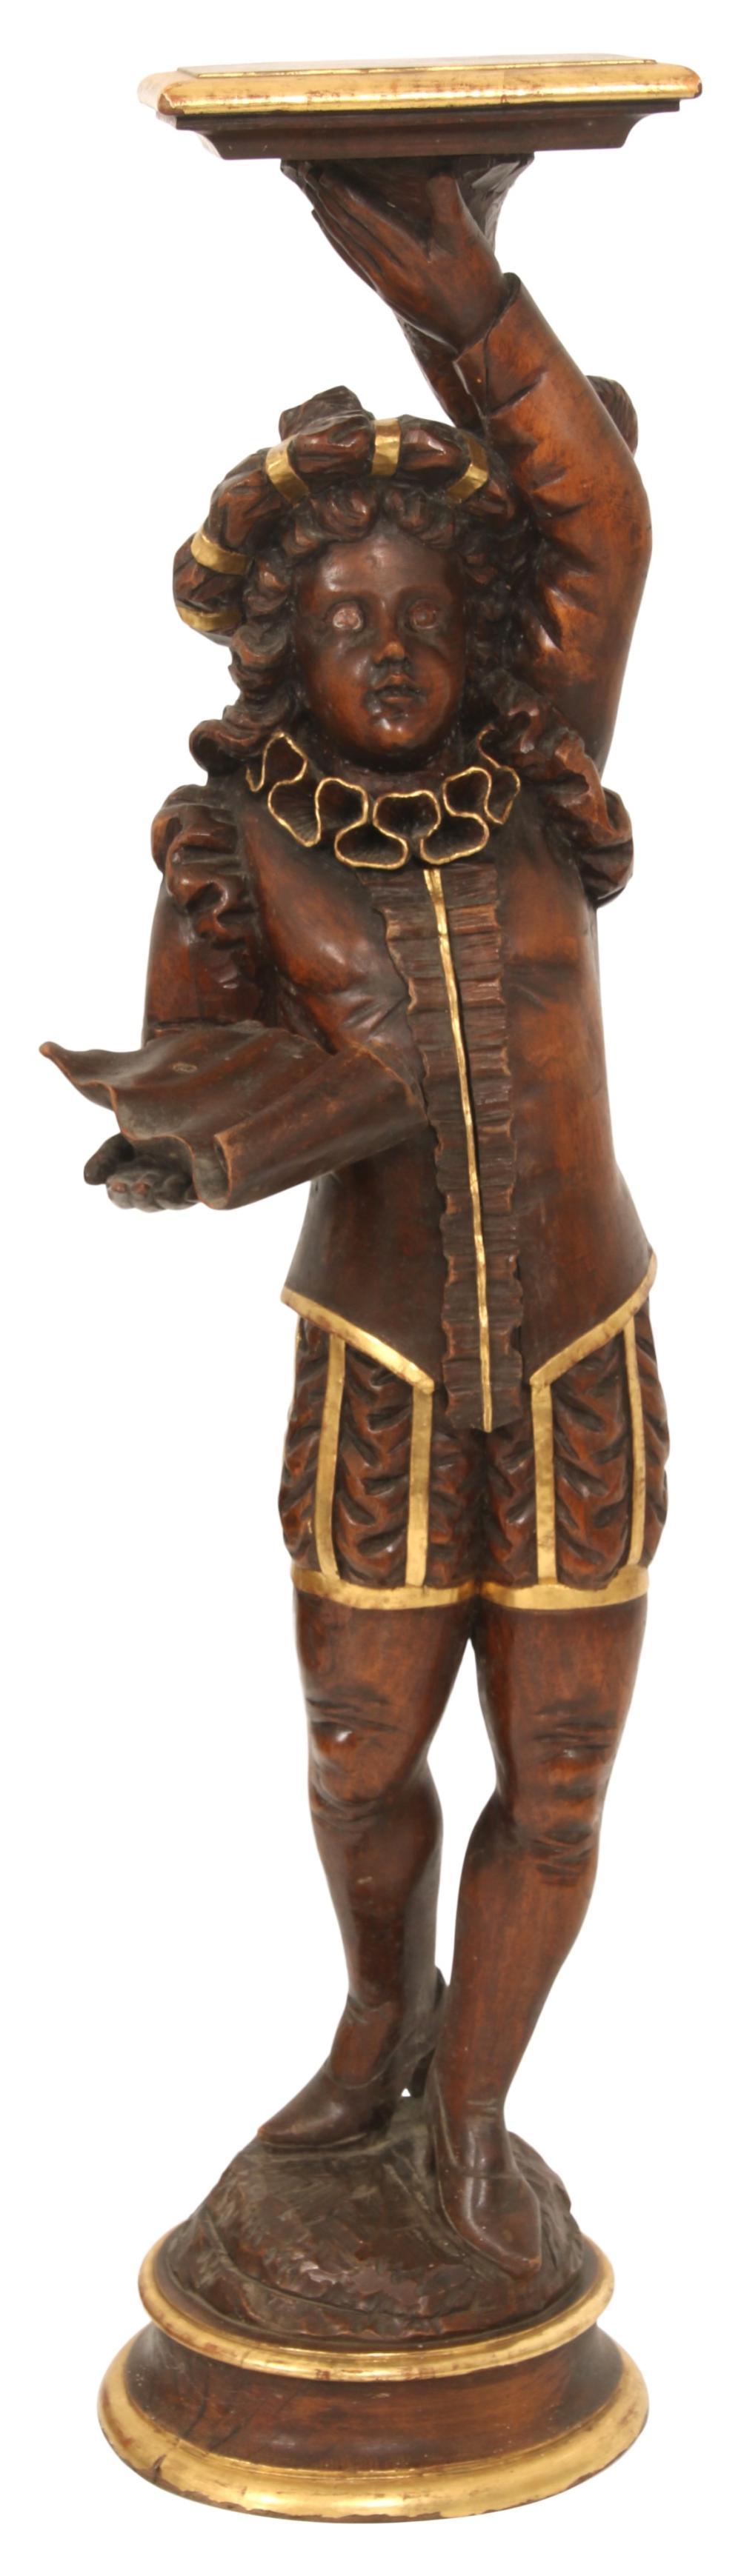 Venetian Carved Wood Figural Pedestal